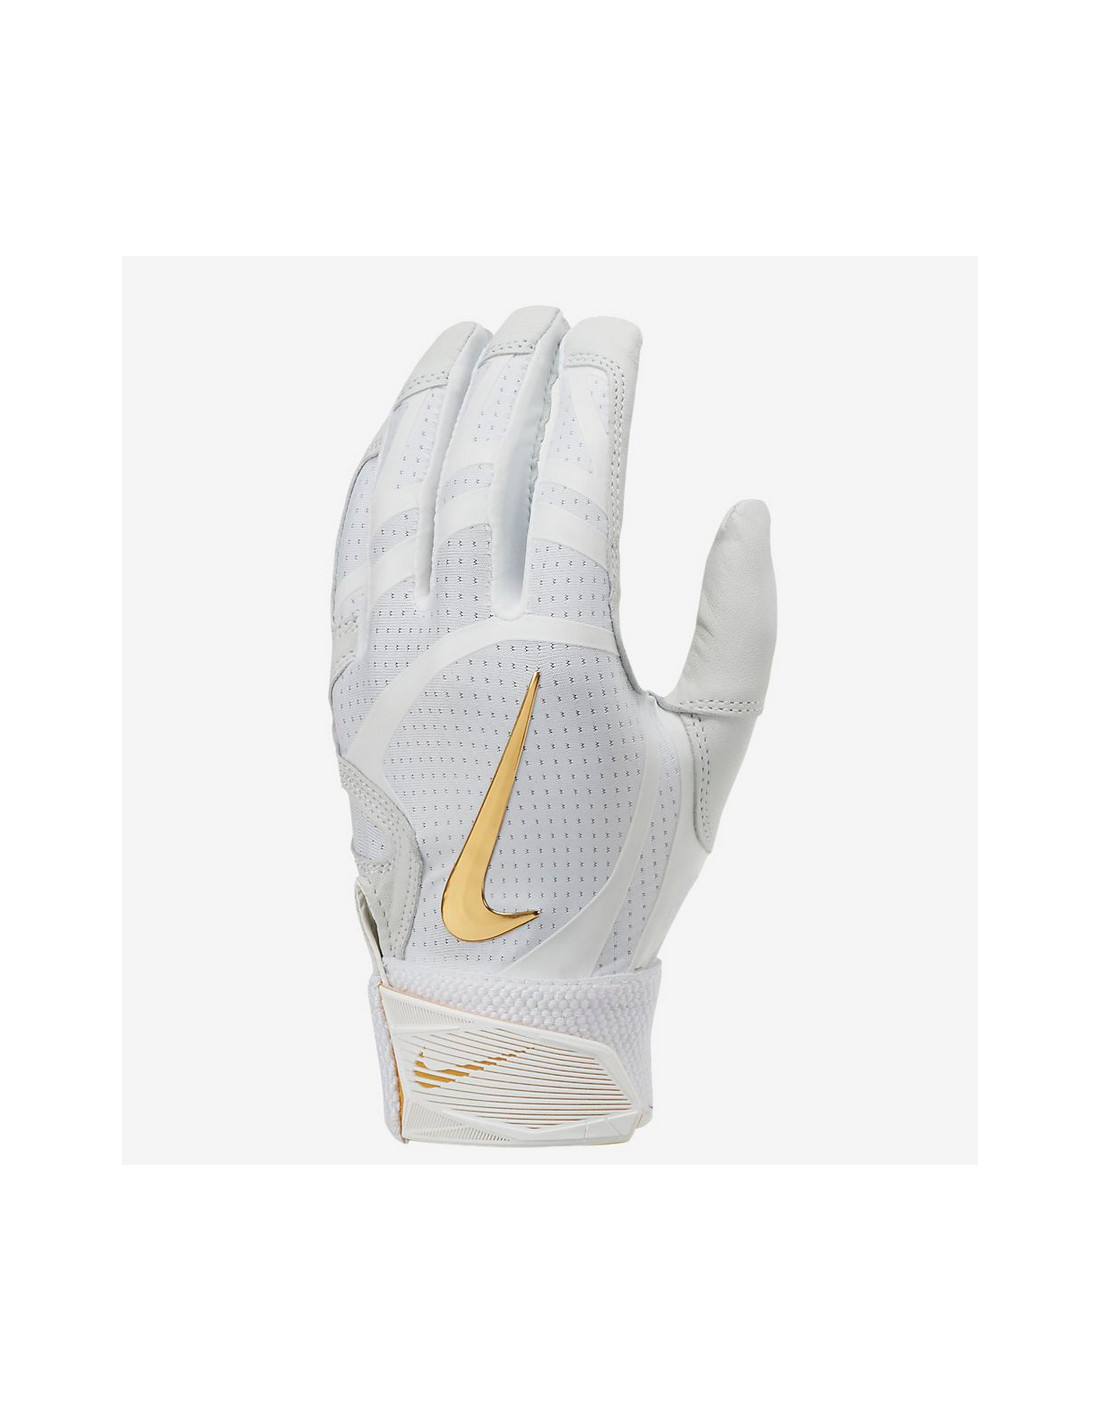 Nike Alpha Huarache Edge Bouncing gloves